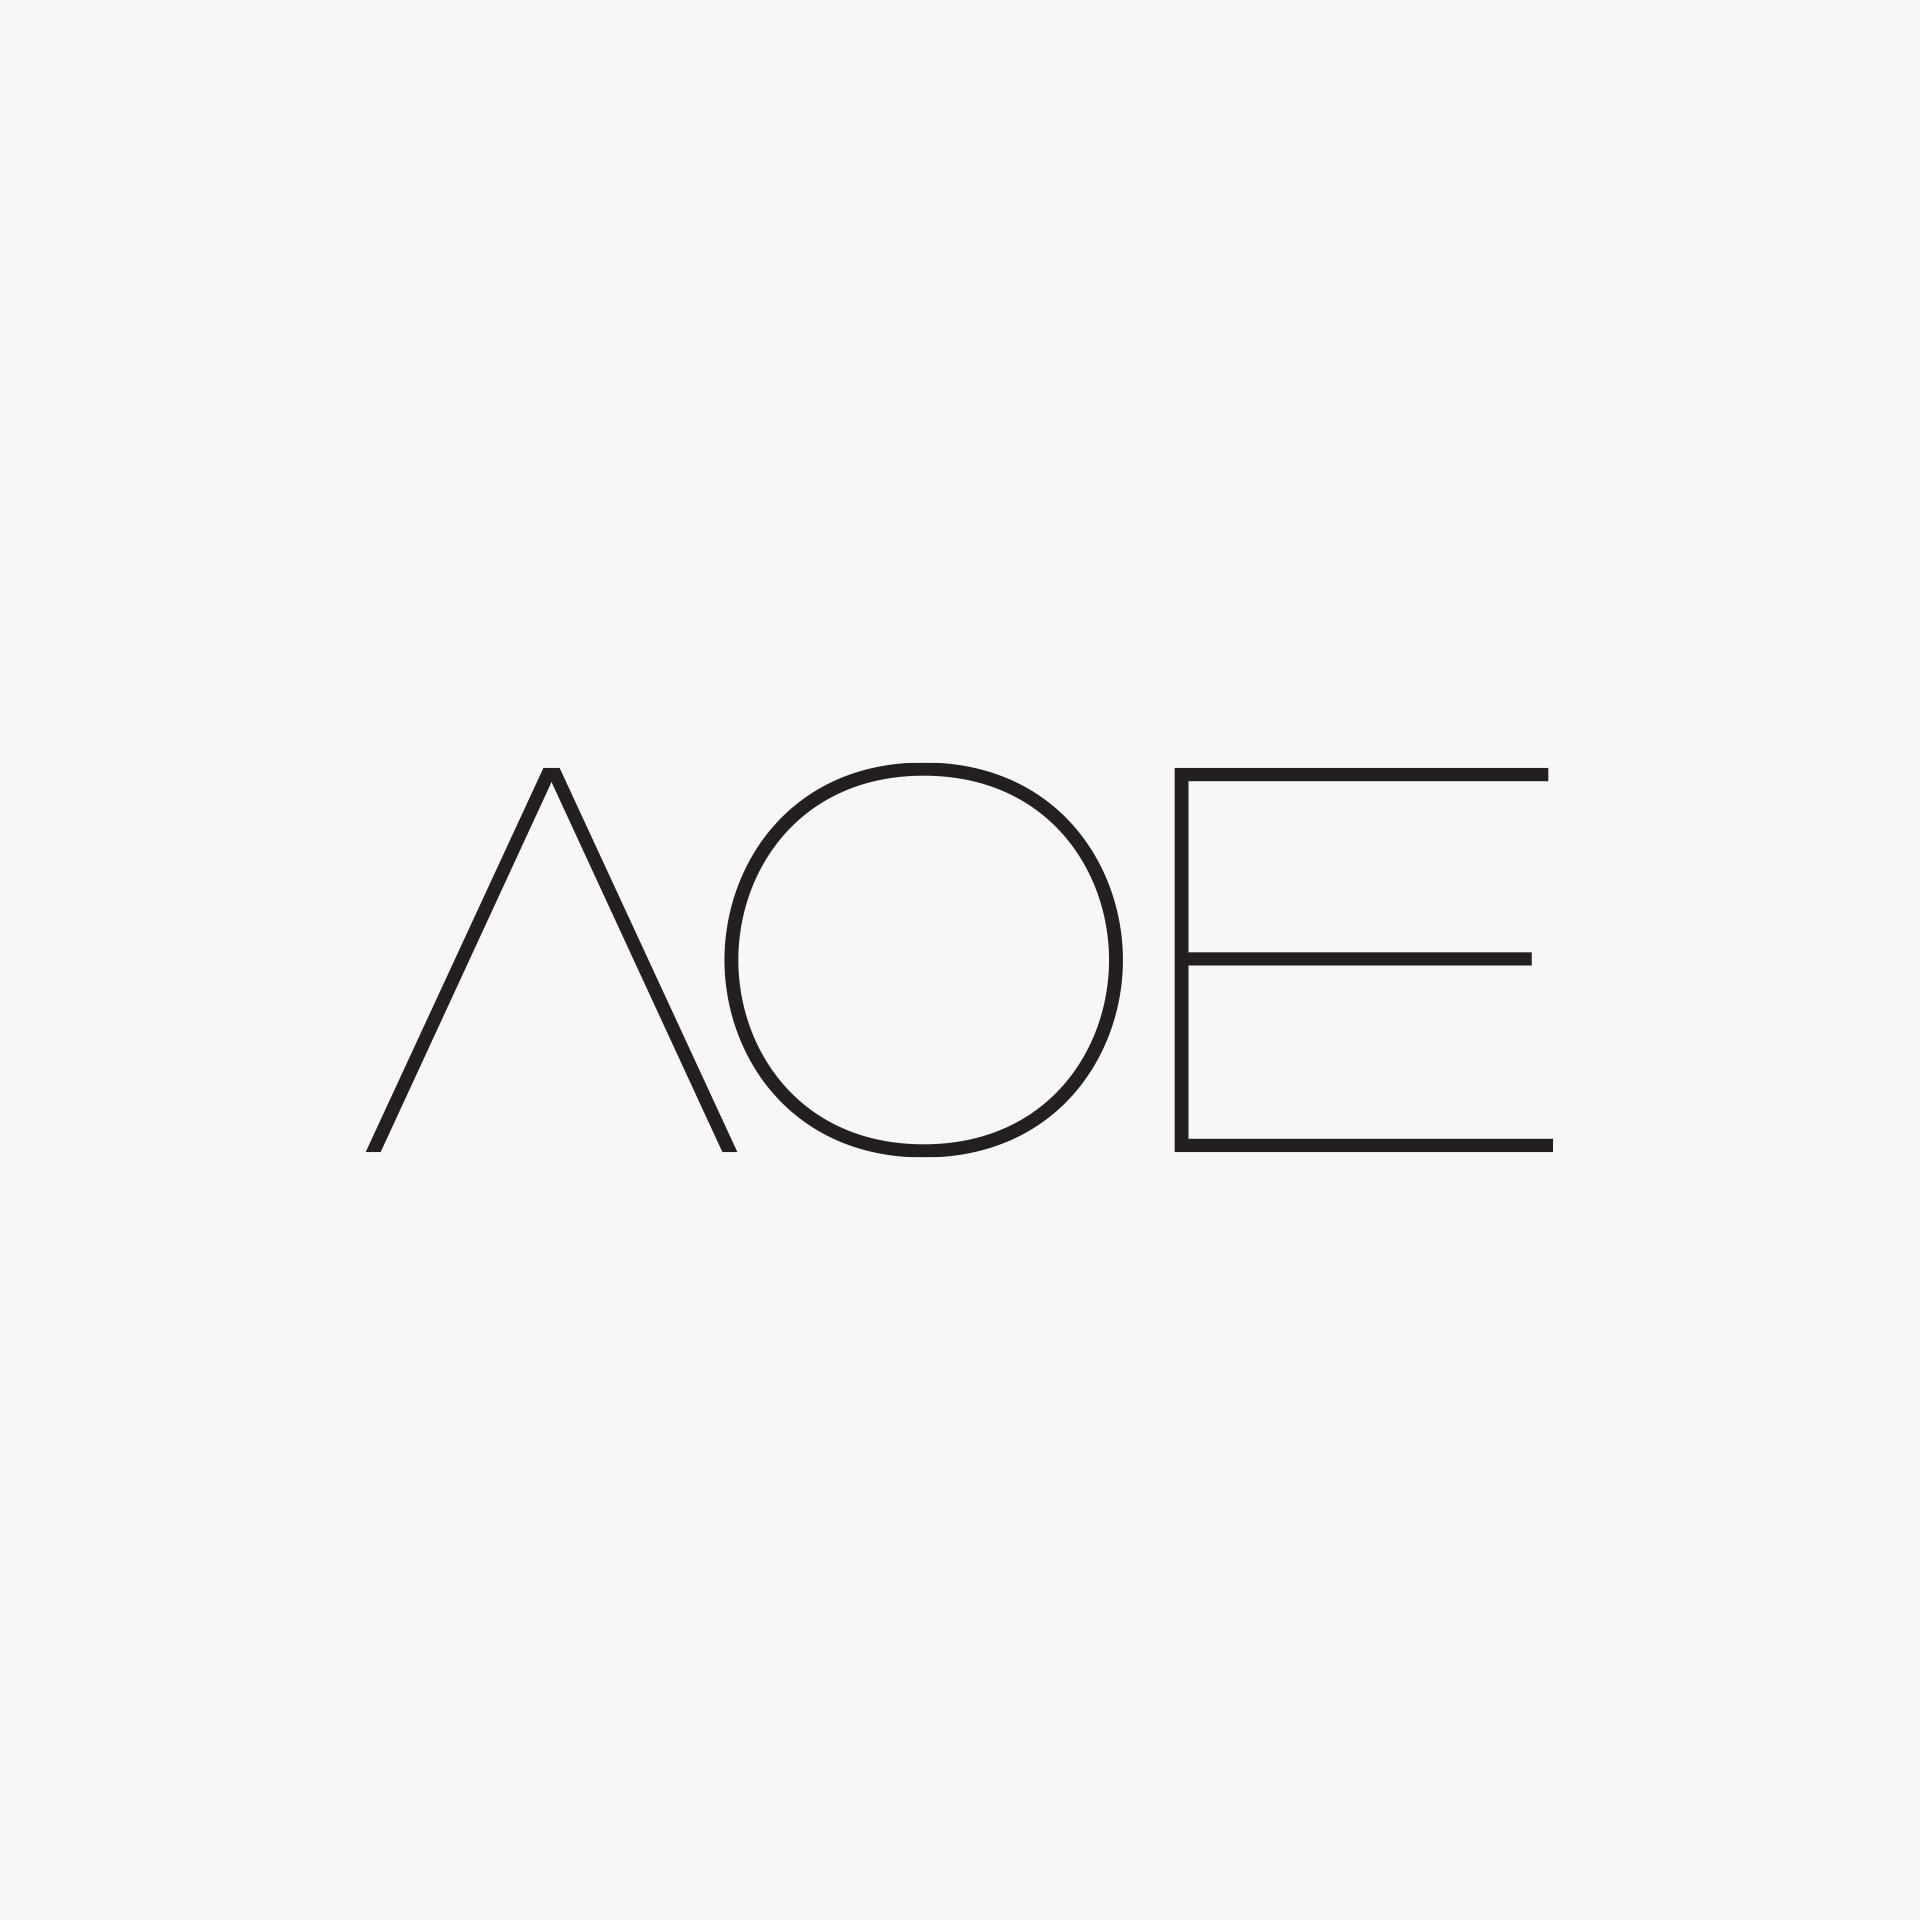 AOE identity design grey logo